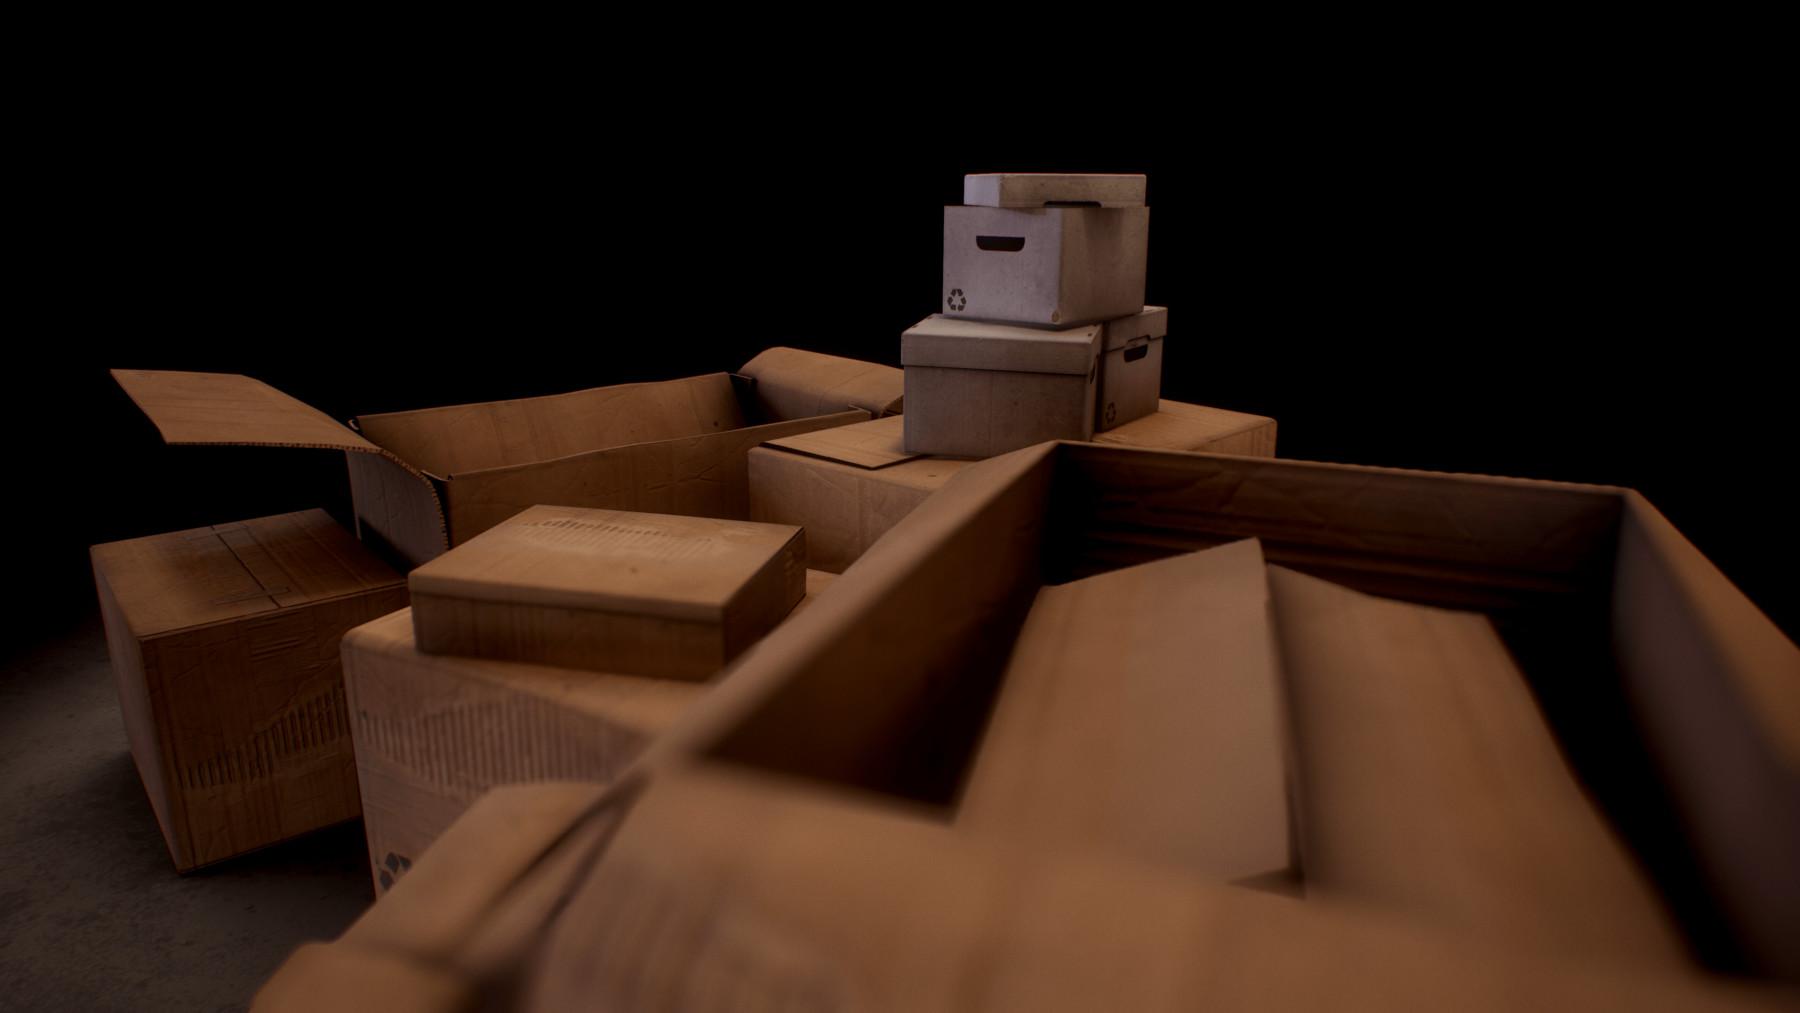 Ducky Duckling - Technical Artist - PBR Cardboard Boxes